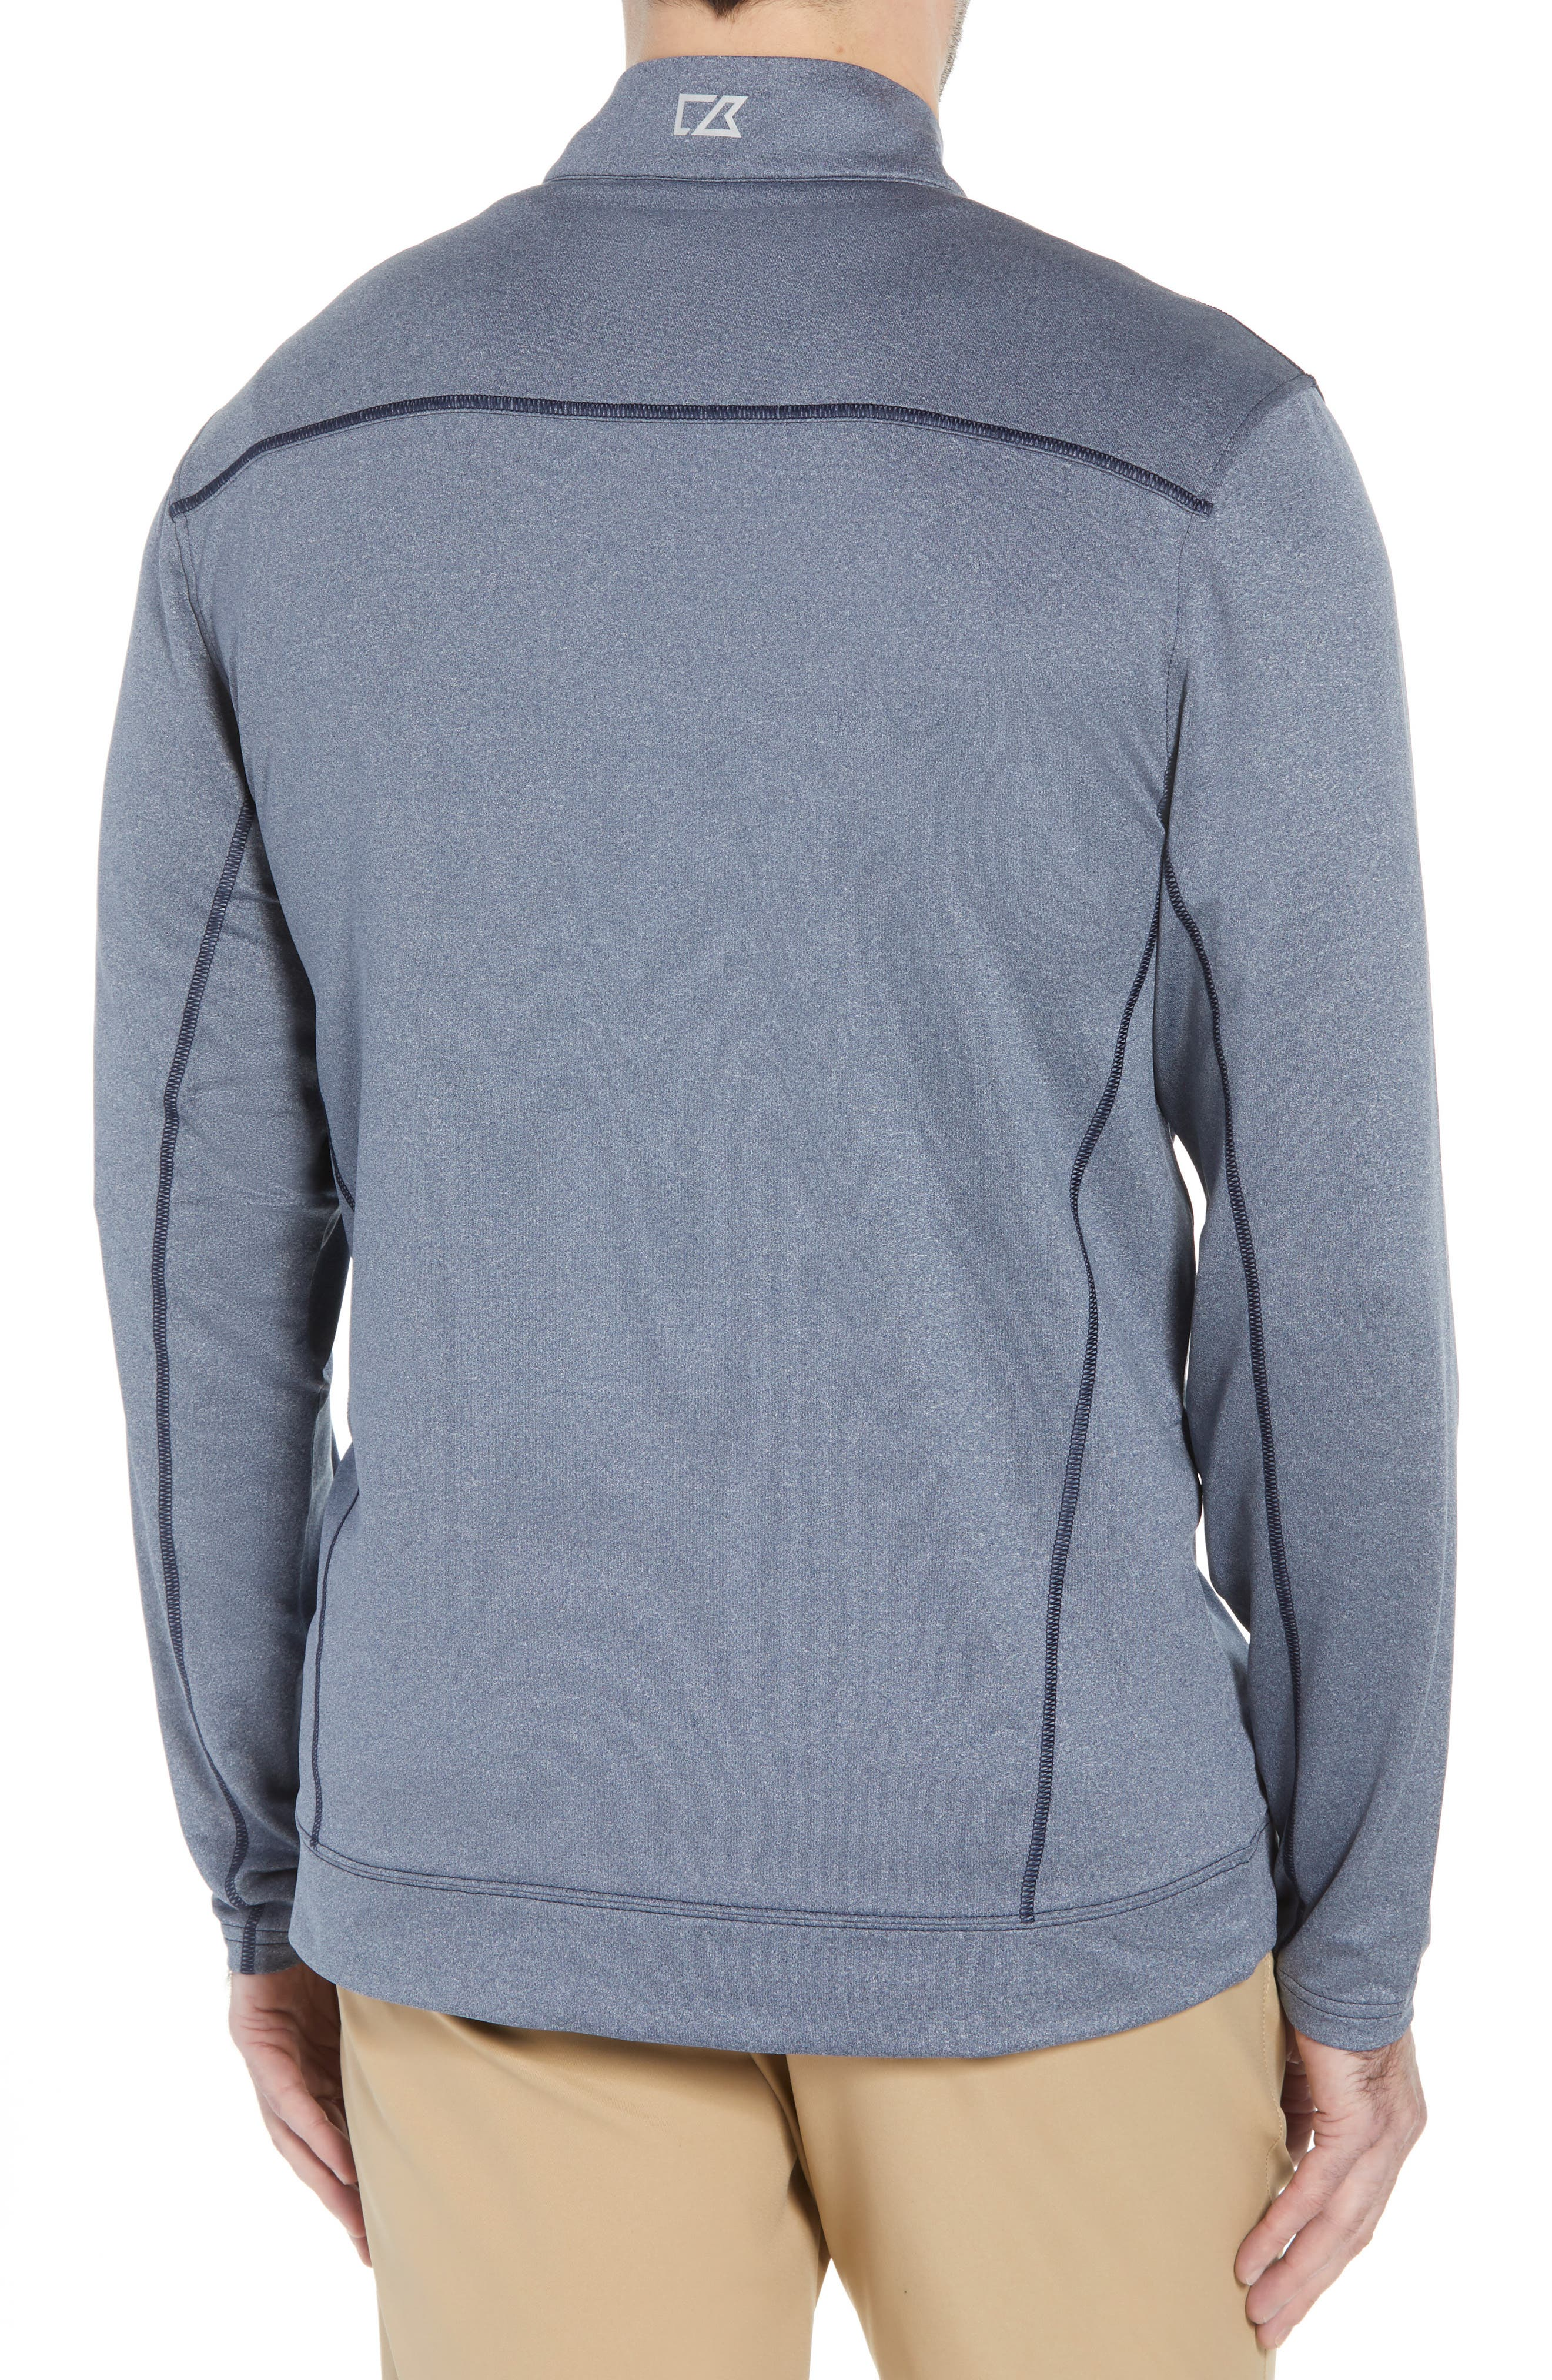 Endurance Houston Texans Regular Fit Pullover,                             Alternate thumbnail 2, color,                             LIBERTY NAVY HEATHER